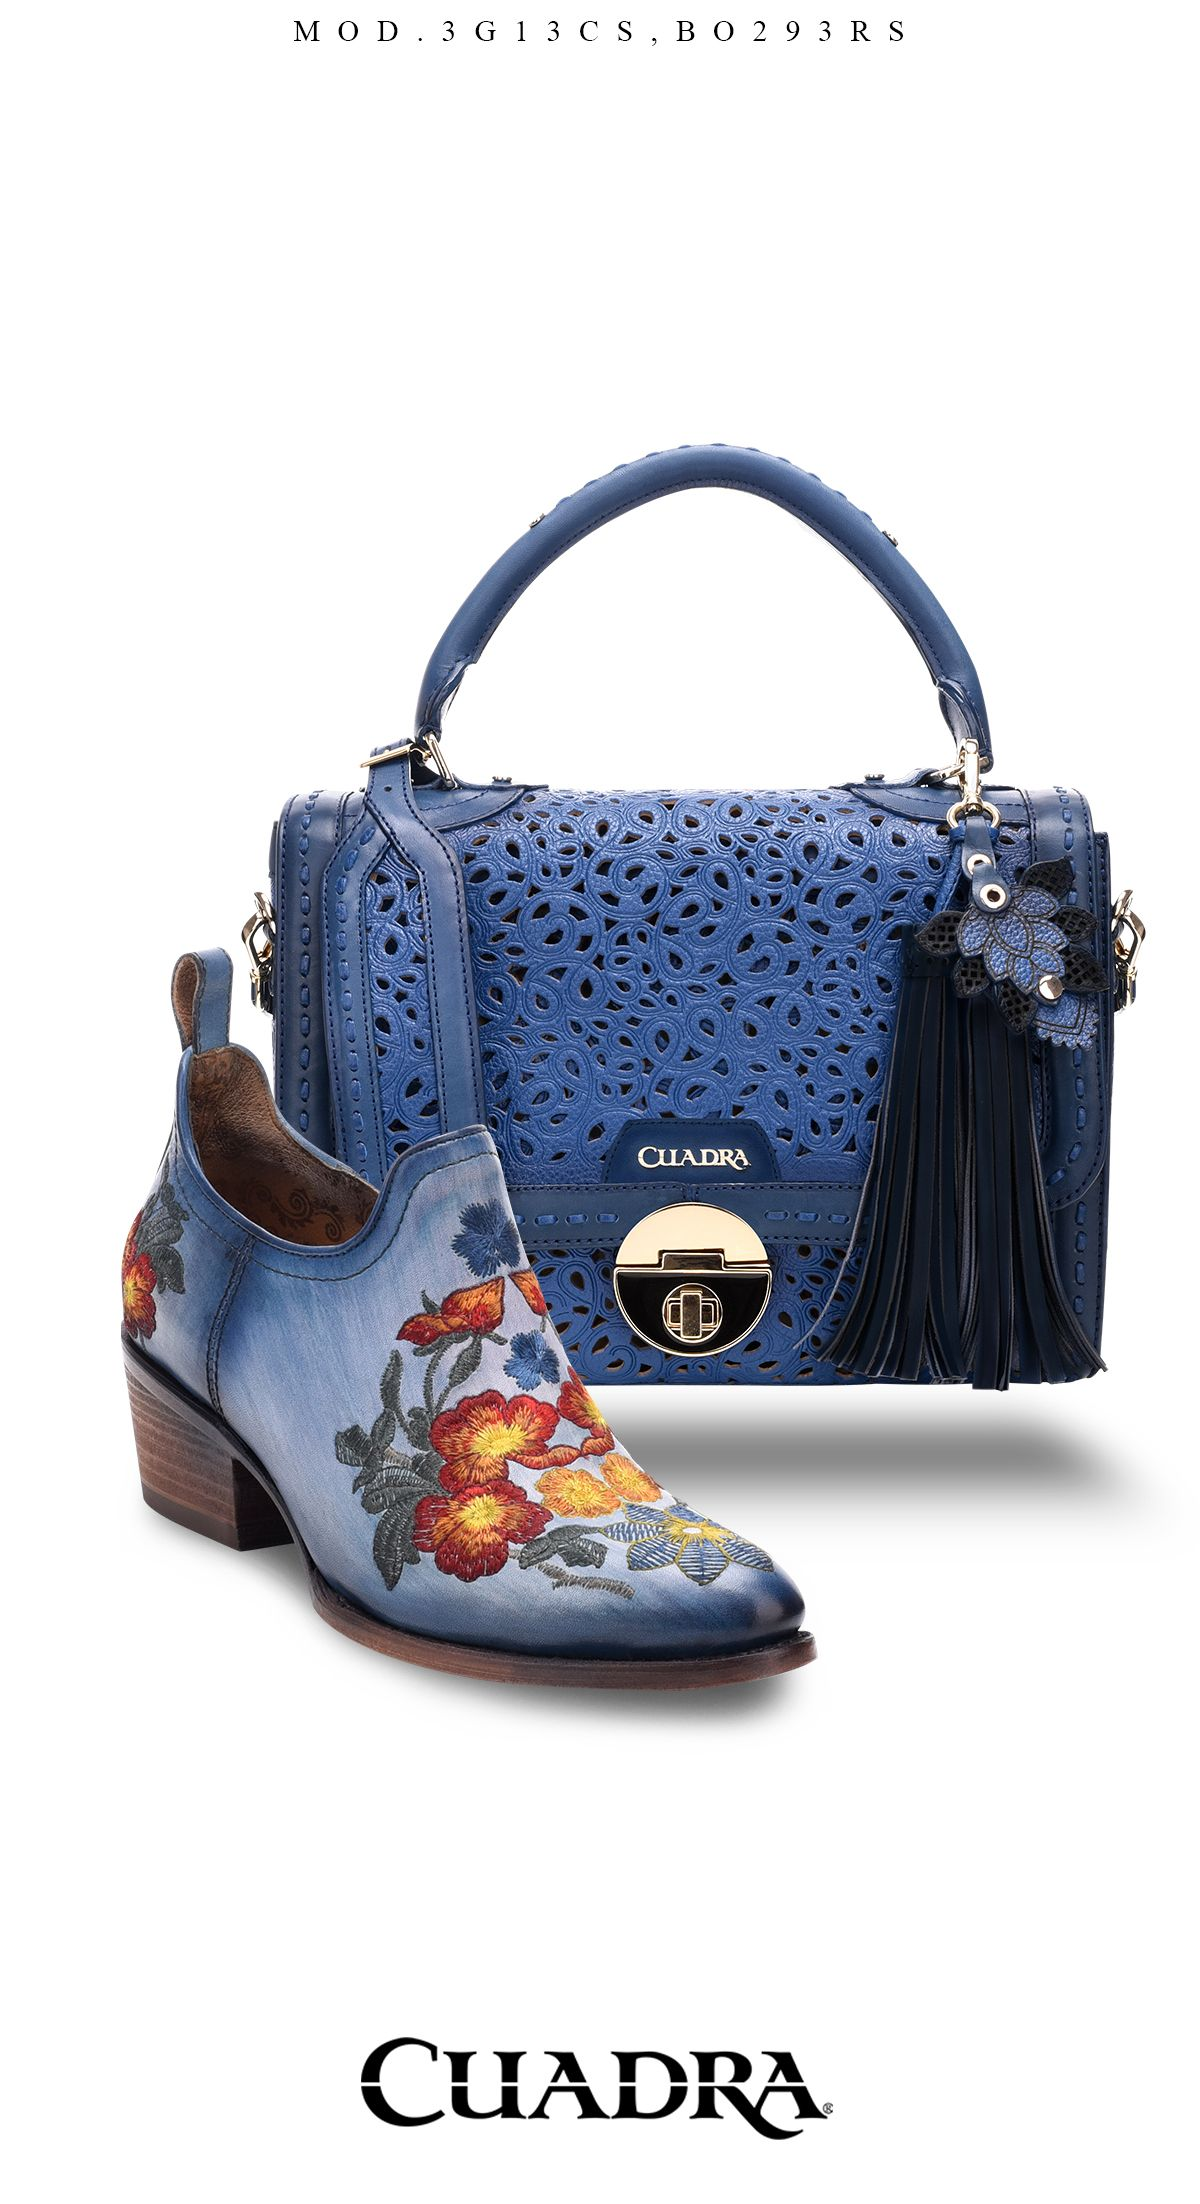 58304f08501 Luce increíble con estos modelos Cuadra.  botines  bolsa  womenpurse   fashion  mujer  woman  blue  azul